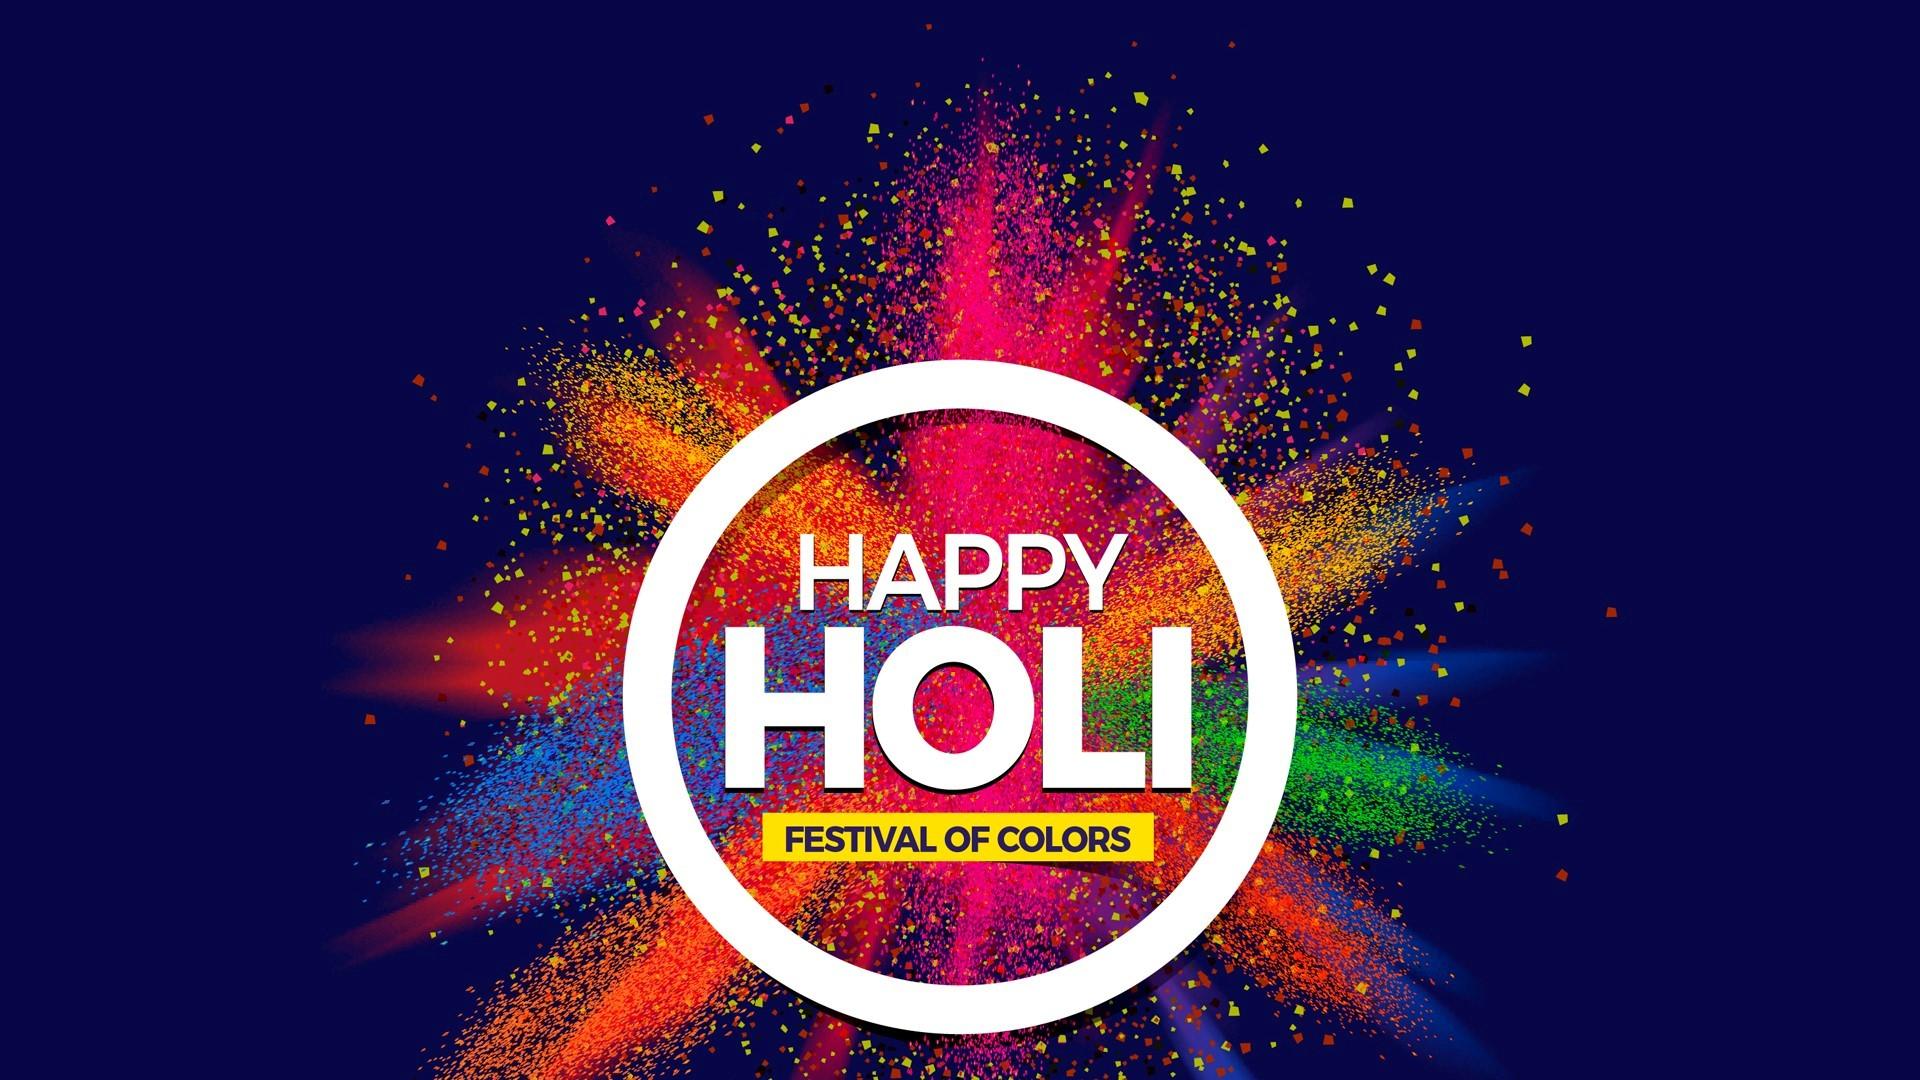 Hd Wallpaper Of Happy Holi Happy Holi Images Hd 1920x1080 Download Hd Wallpaper Wallpapertip